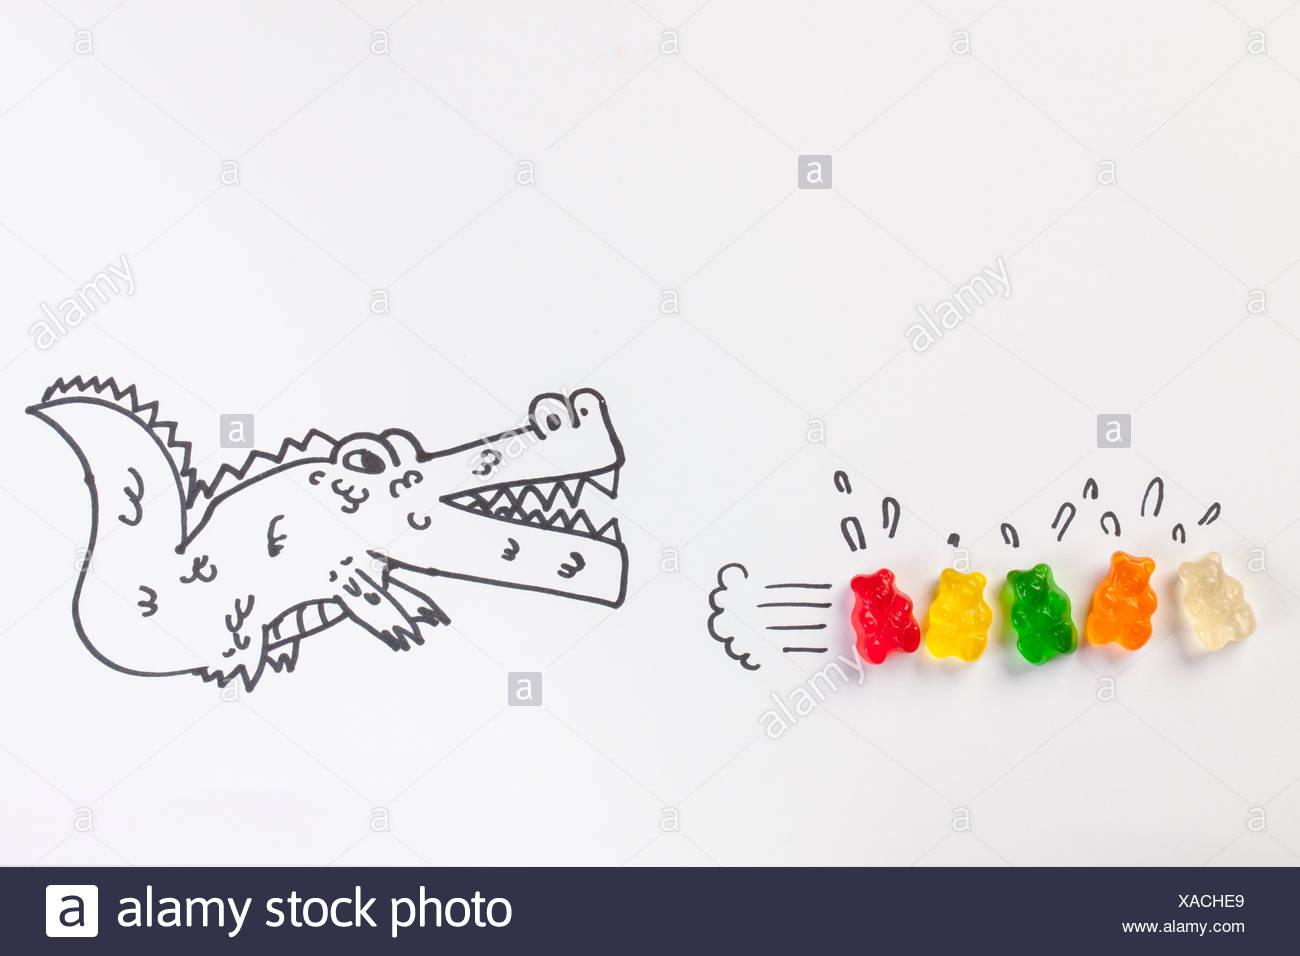 Illustration de alligator menaçant les petits animaux Photo Stock